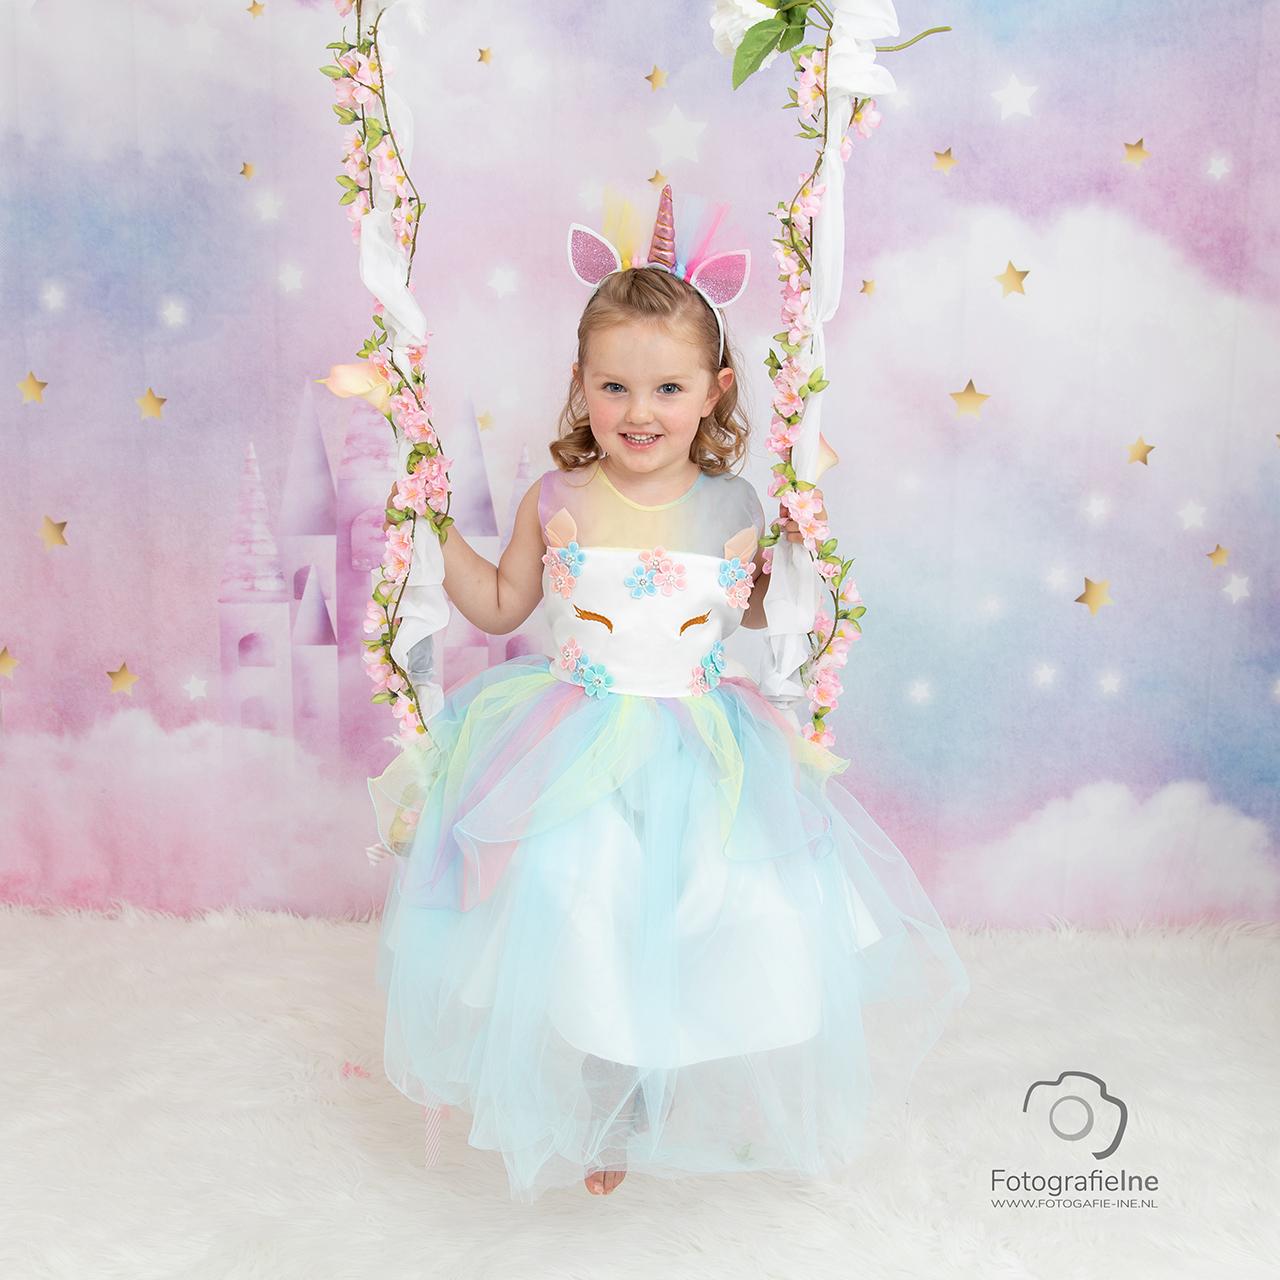 Fotografie Ine Prinsessen fotoshoot unicorn